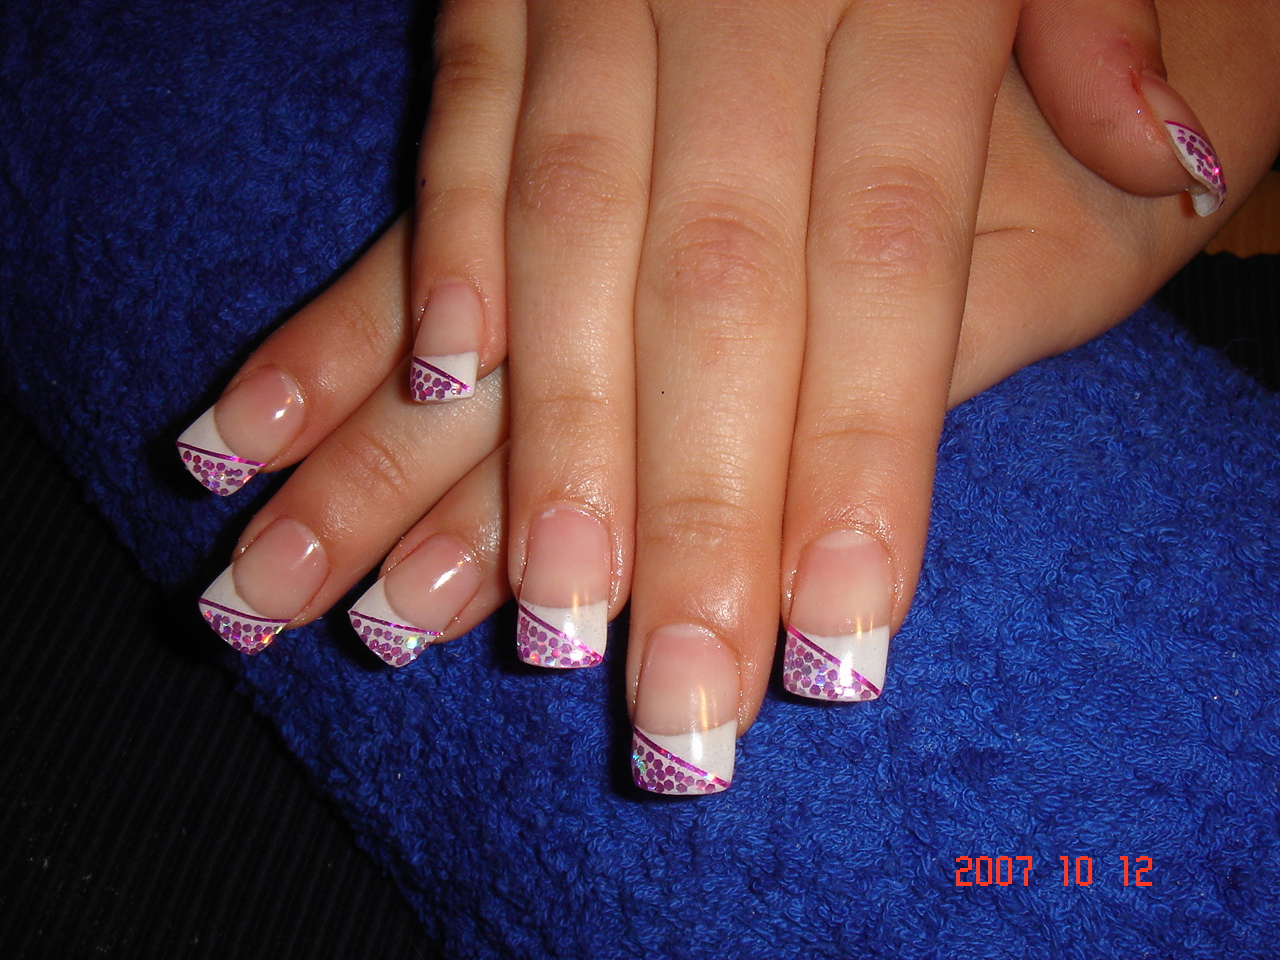 Фото рисунков на ногтях смотреть